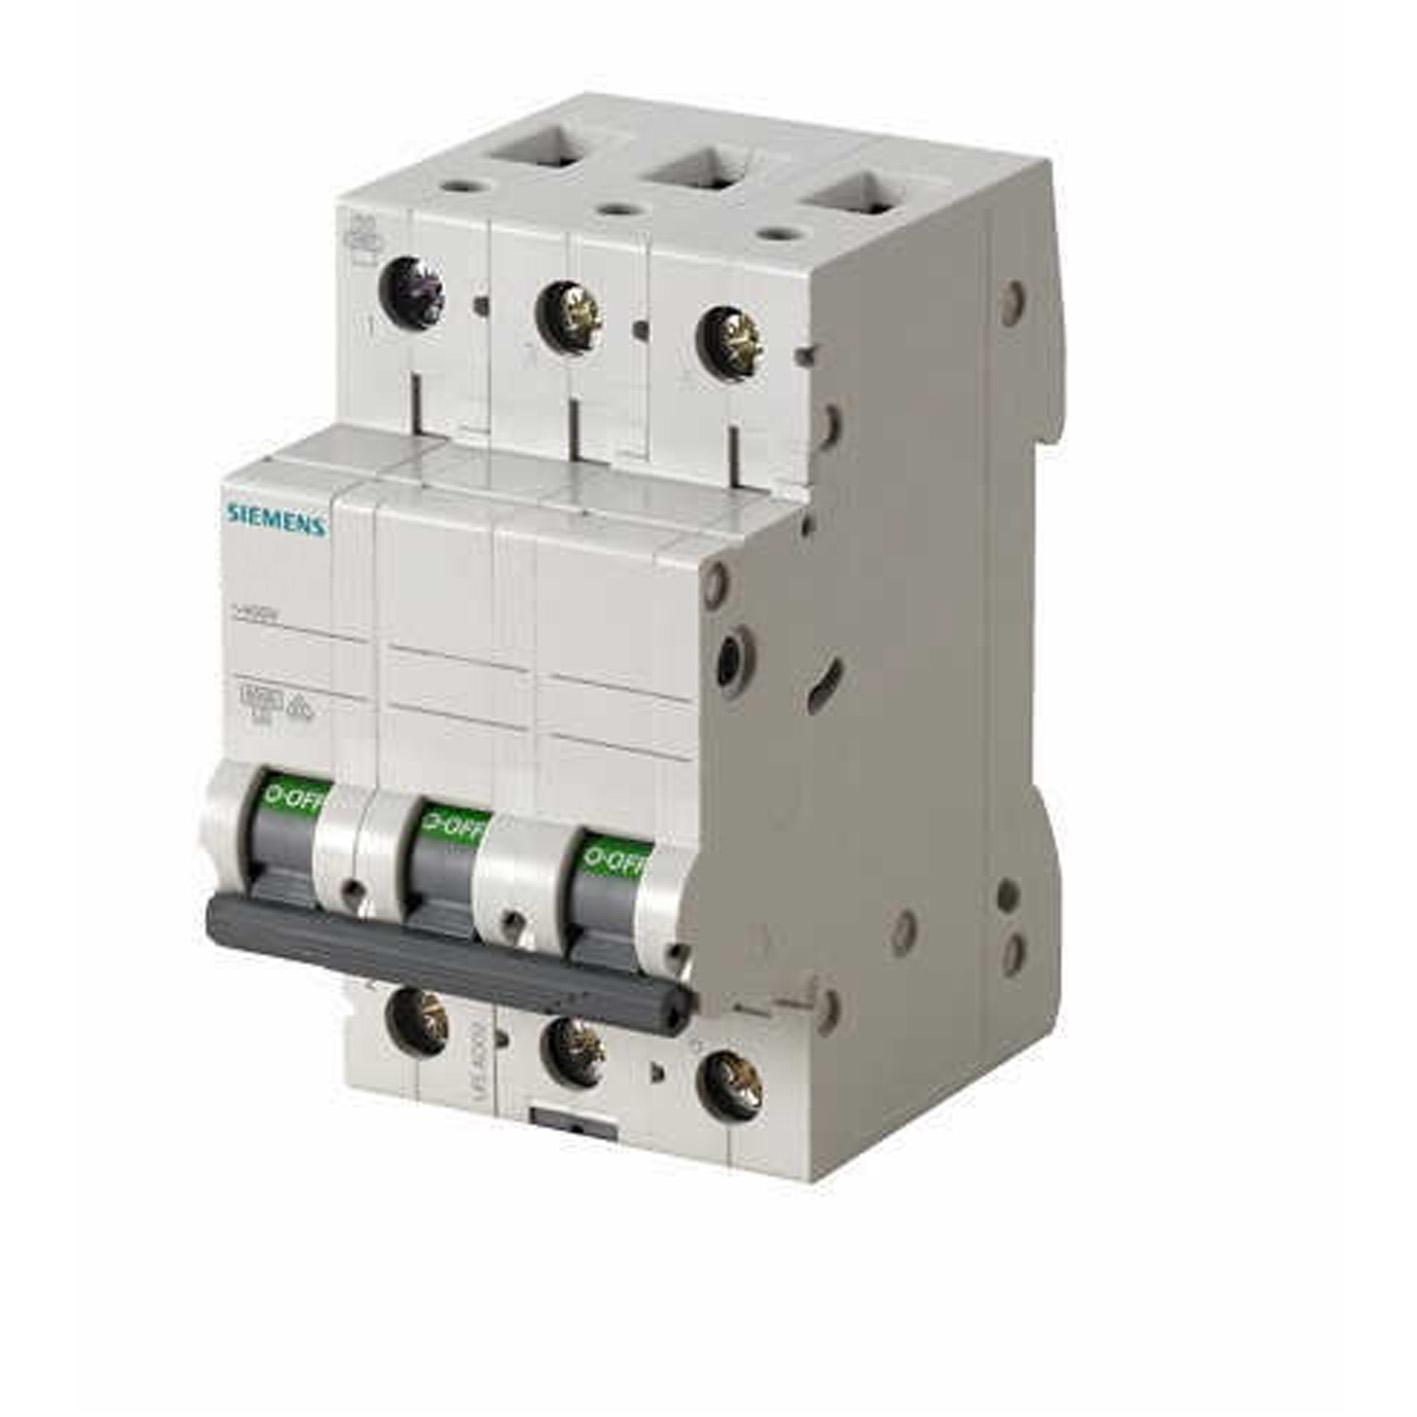 Siemens 3X16A Otomatik Sigorta